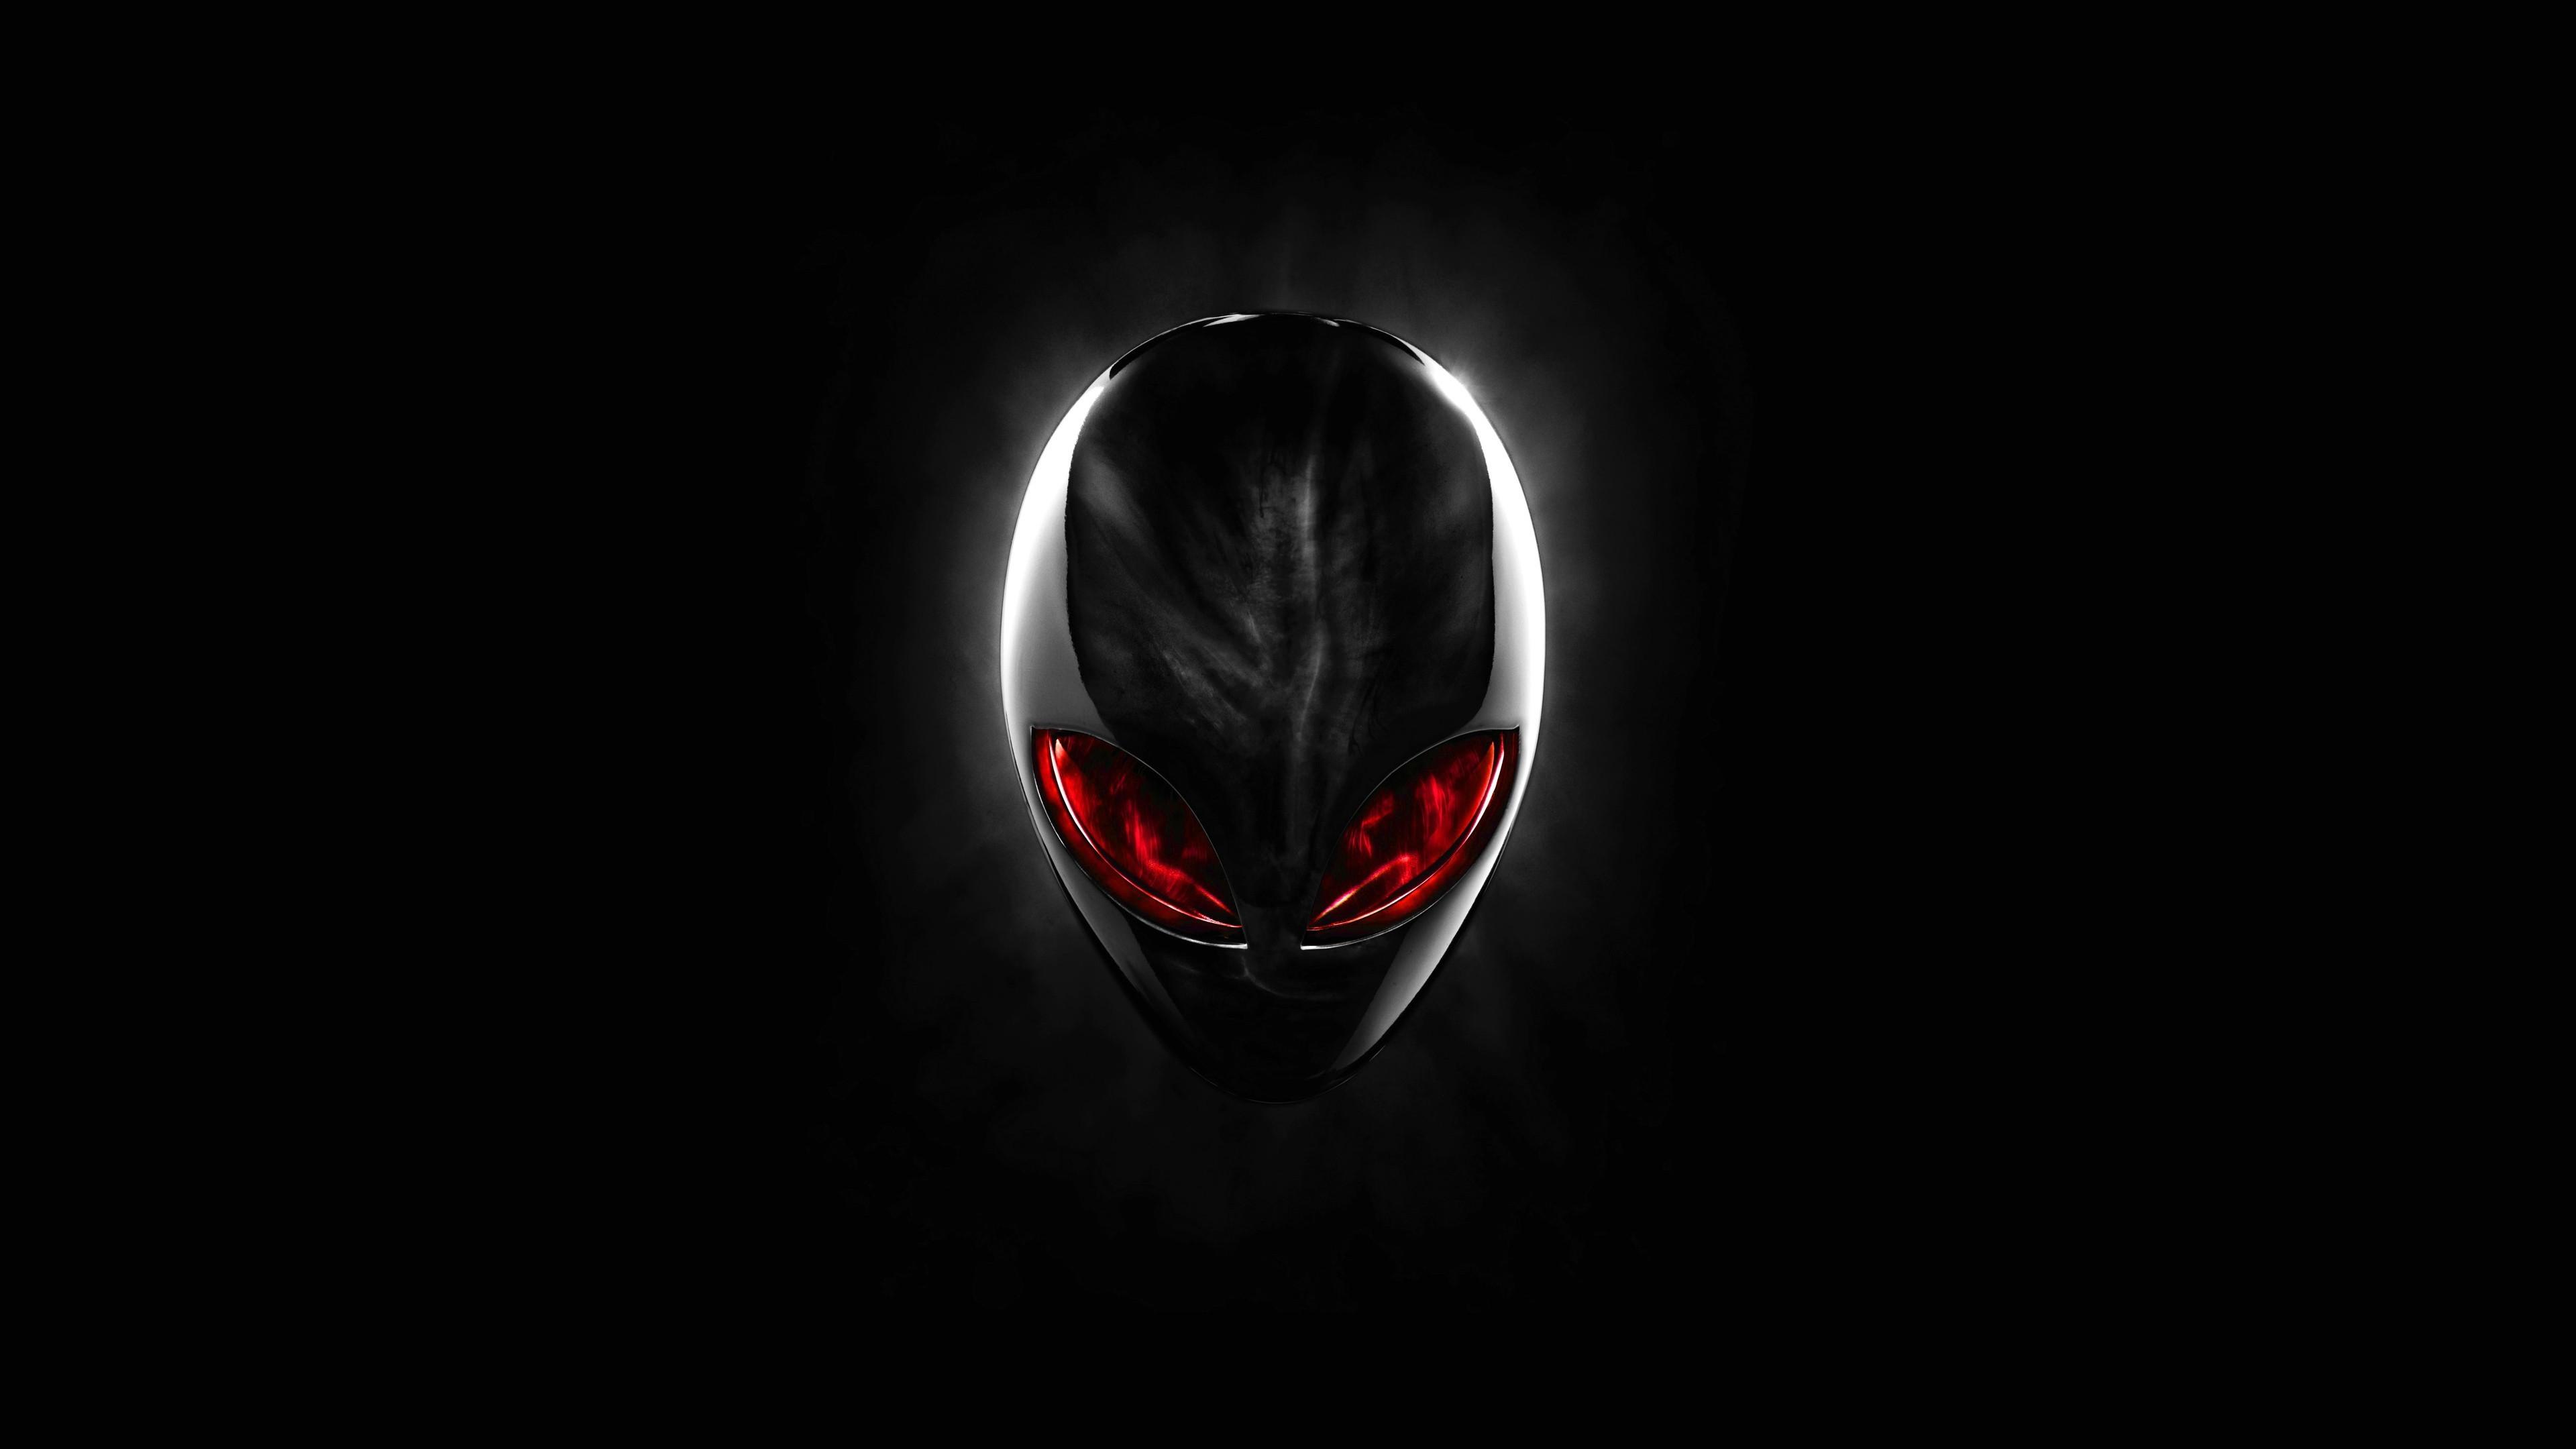 alienware high resolution wallpaper 4k | View HD